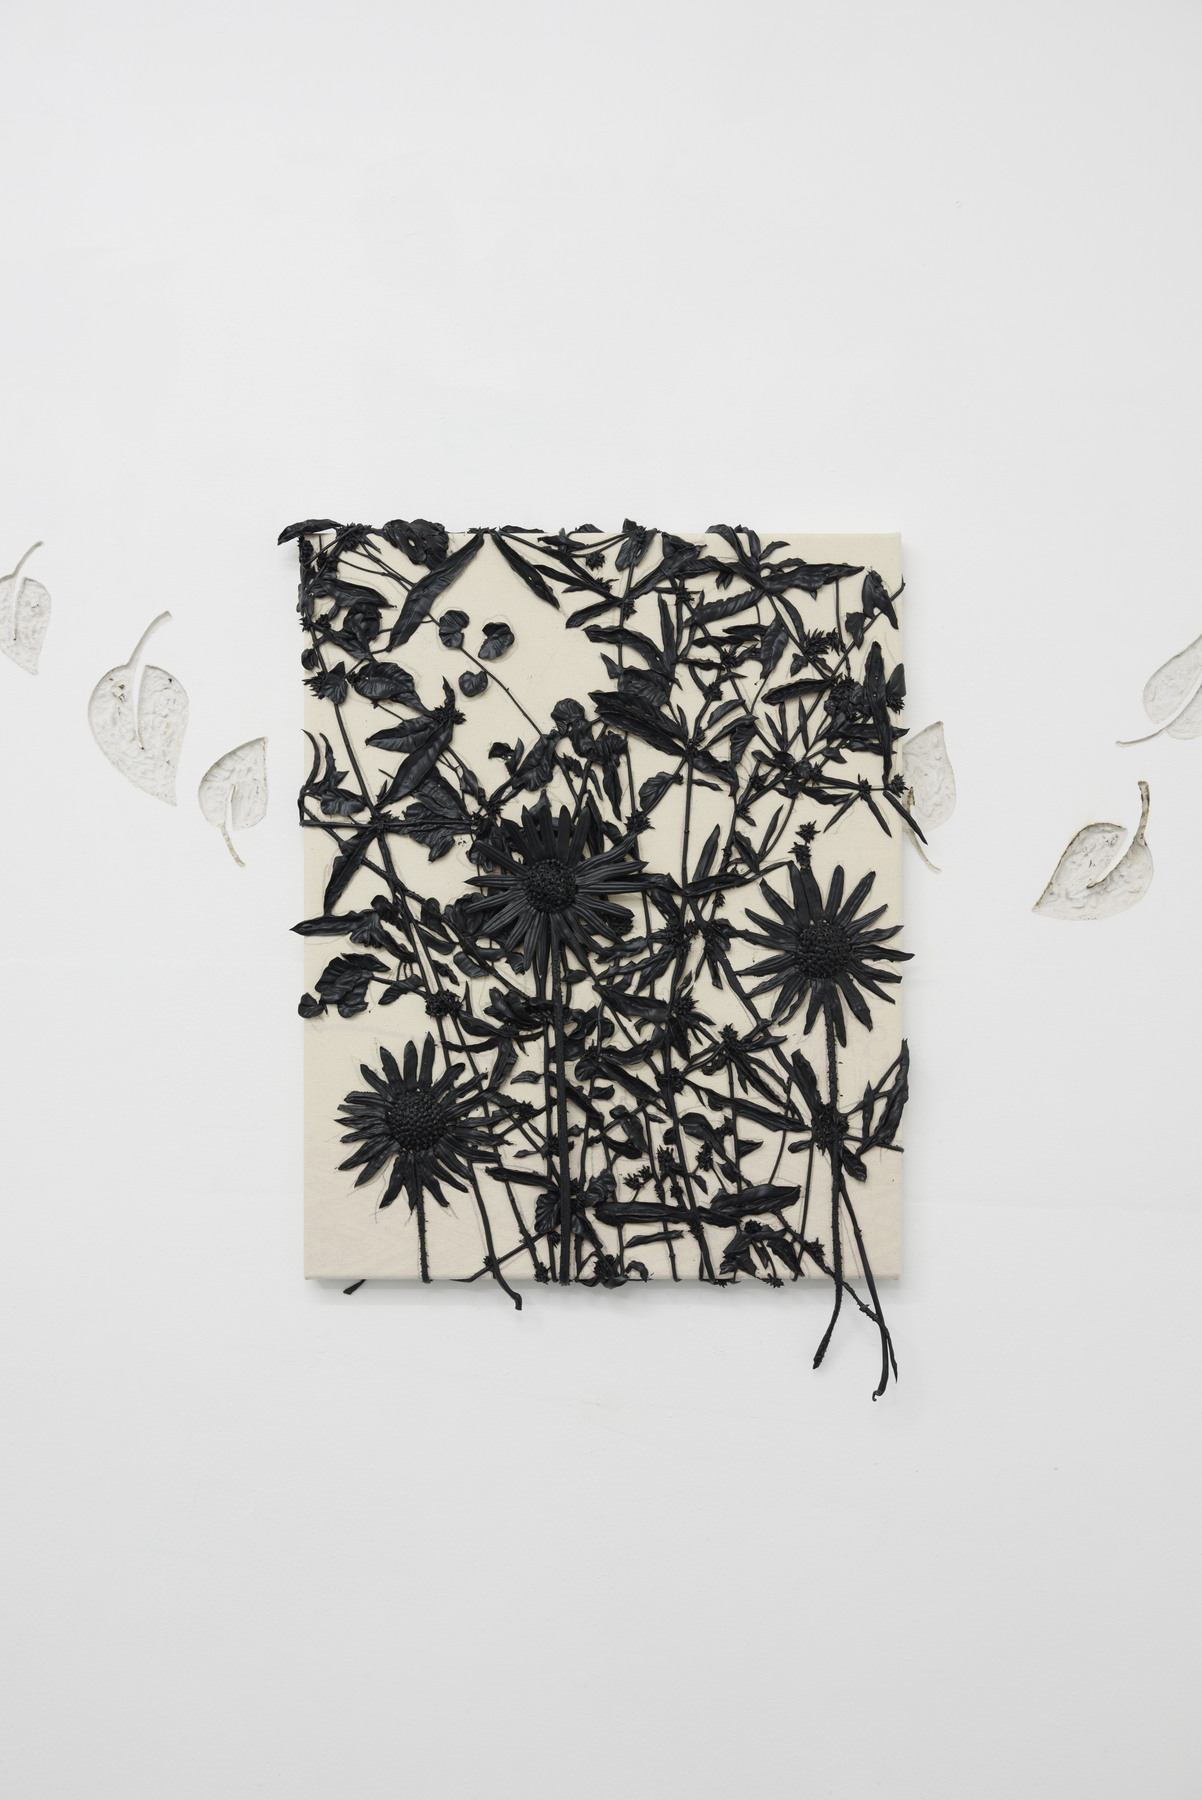 Michael Assiff-Ozone Flowers 12